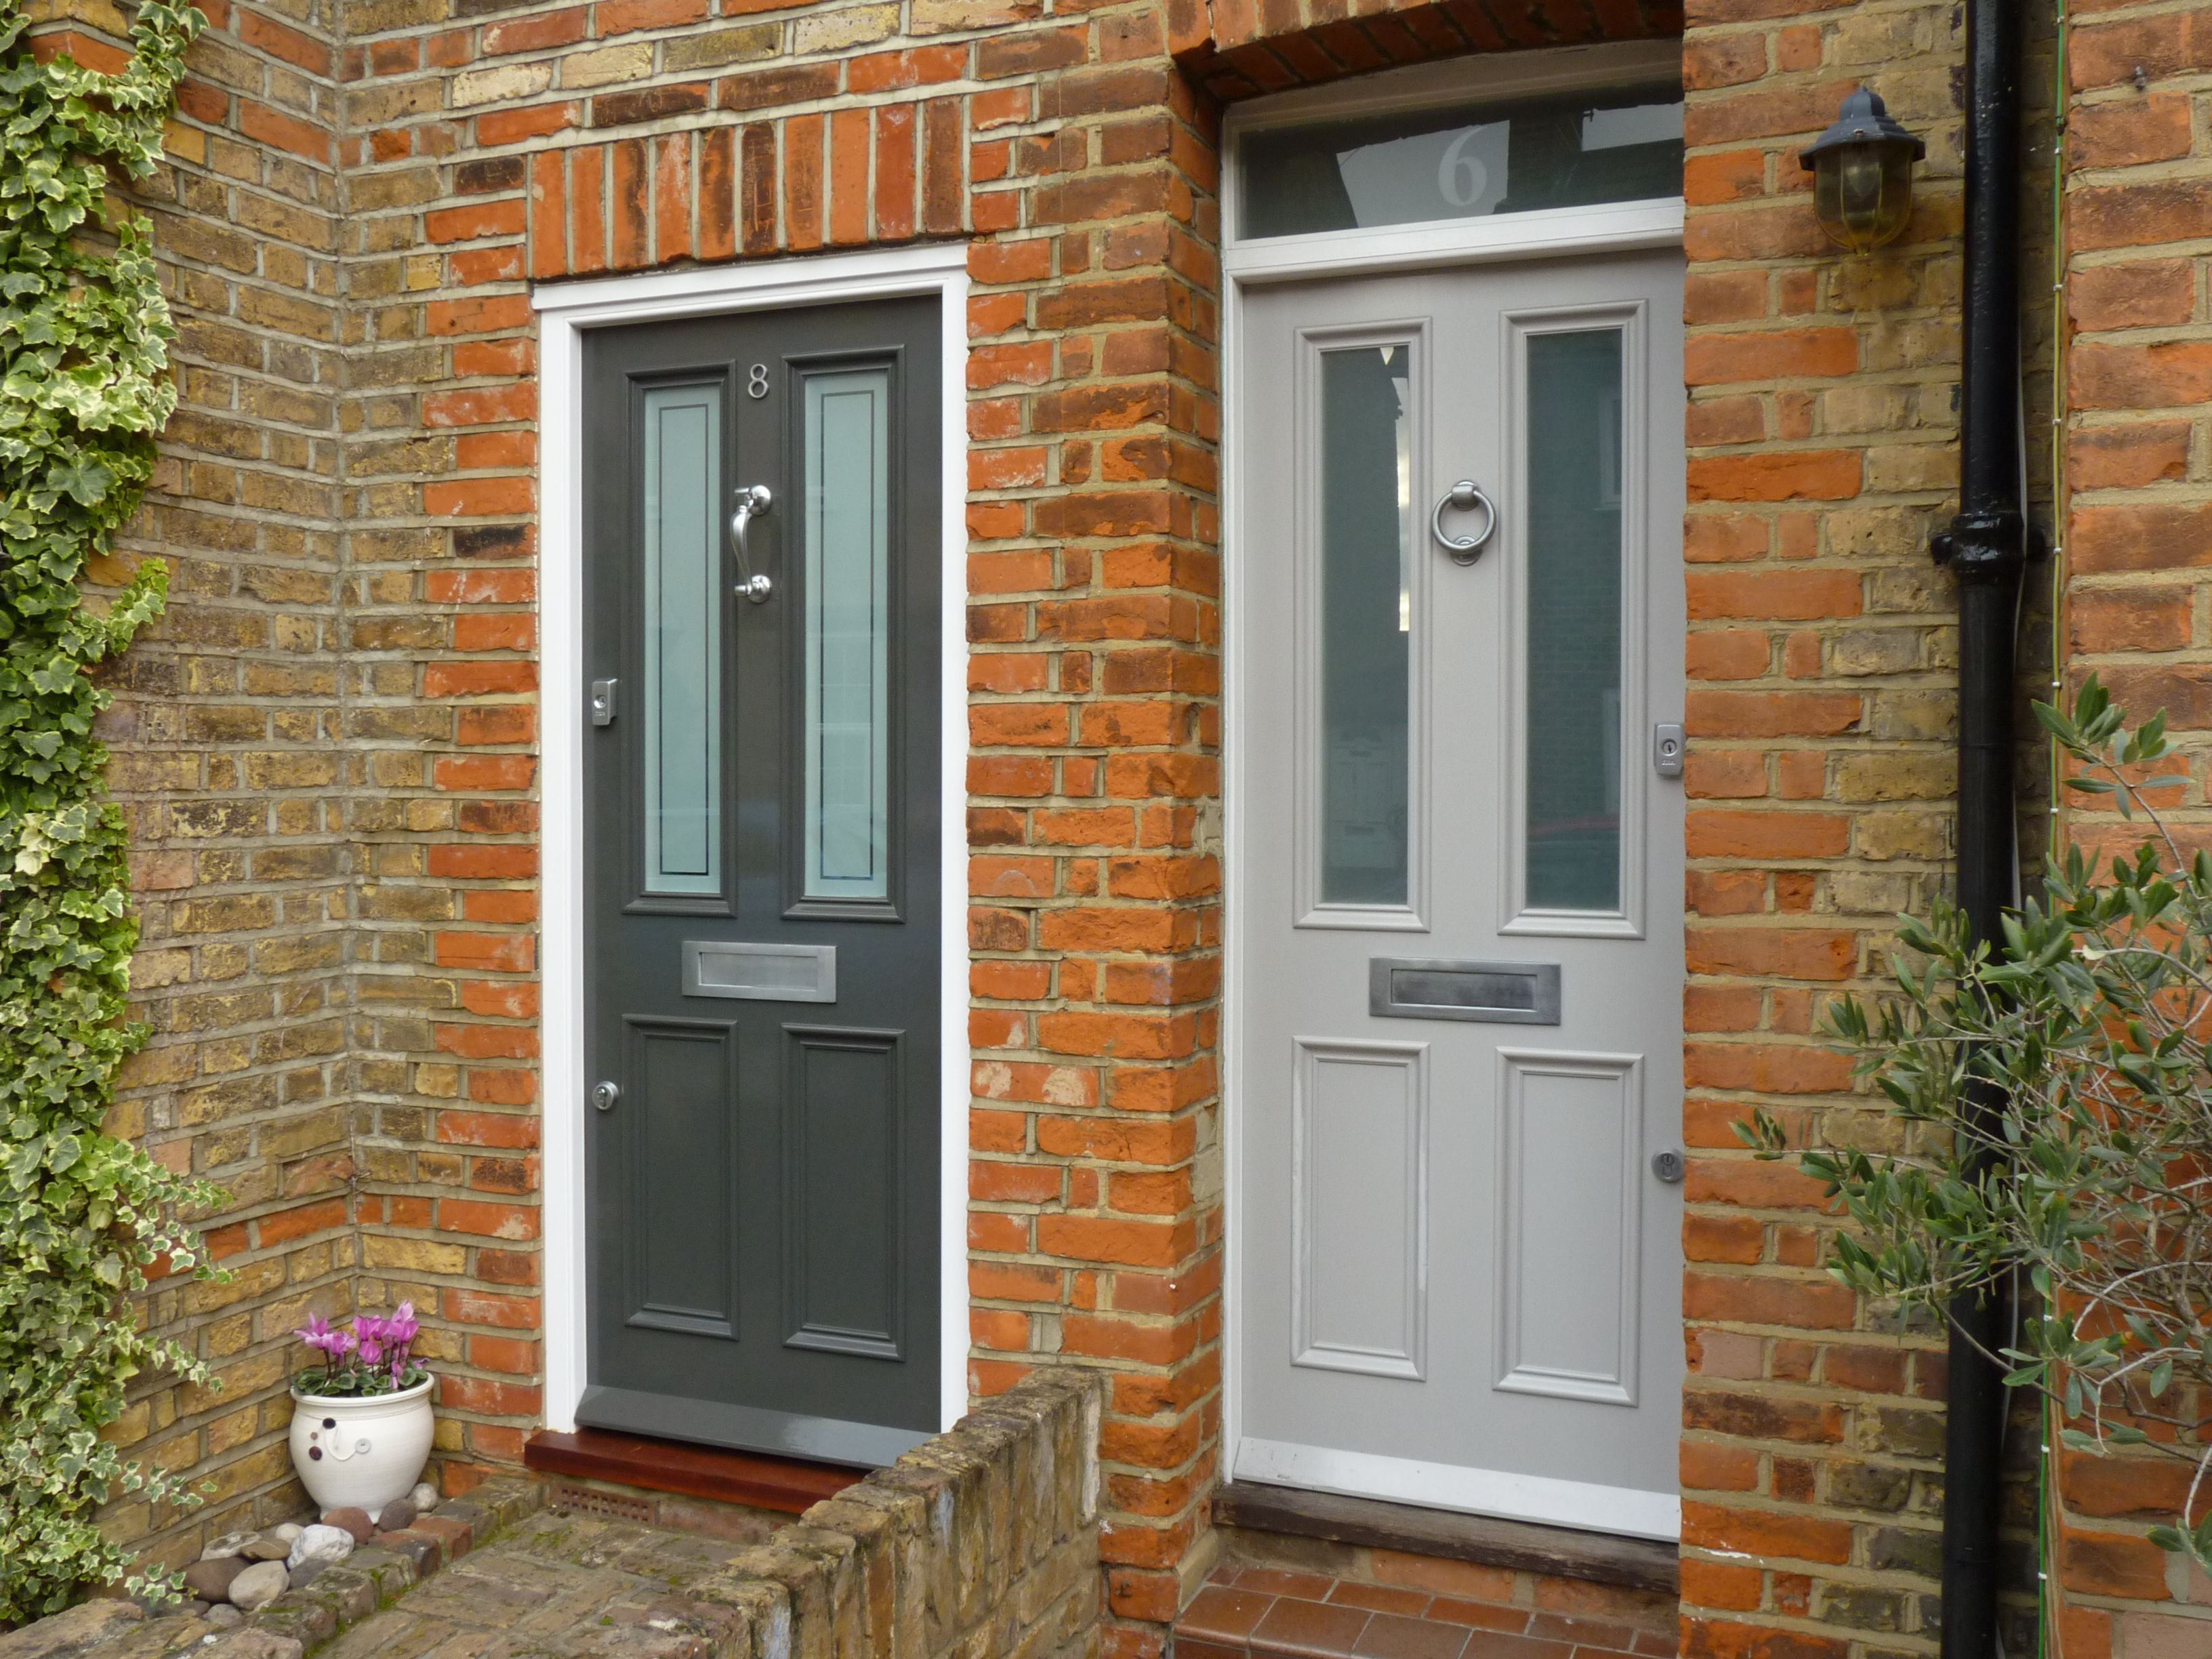 The London Door Company | Accoya – Acetylated Wood | {Wood} Accoya ...